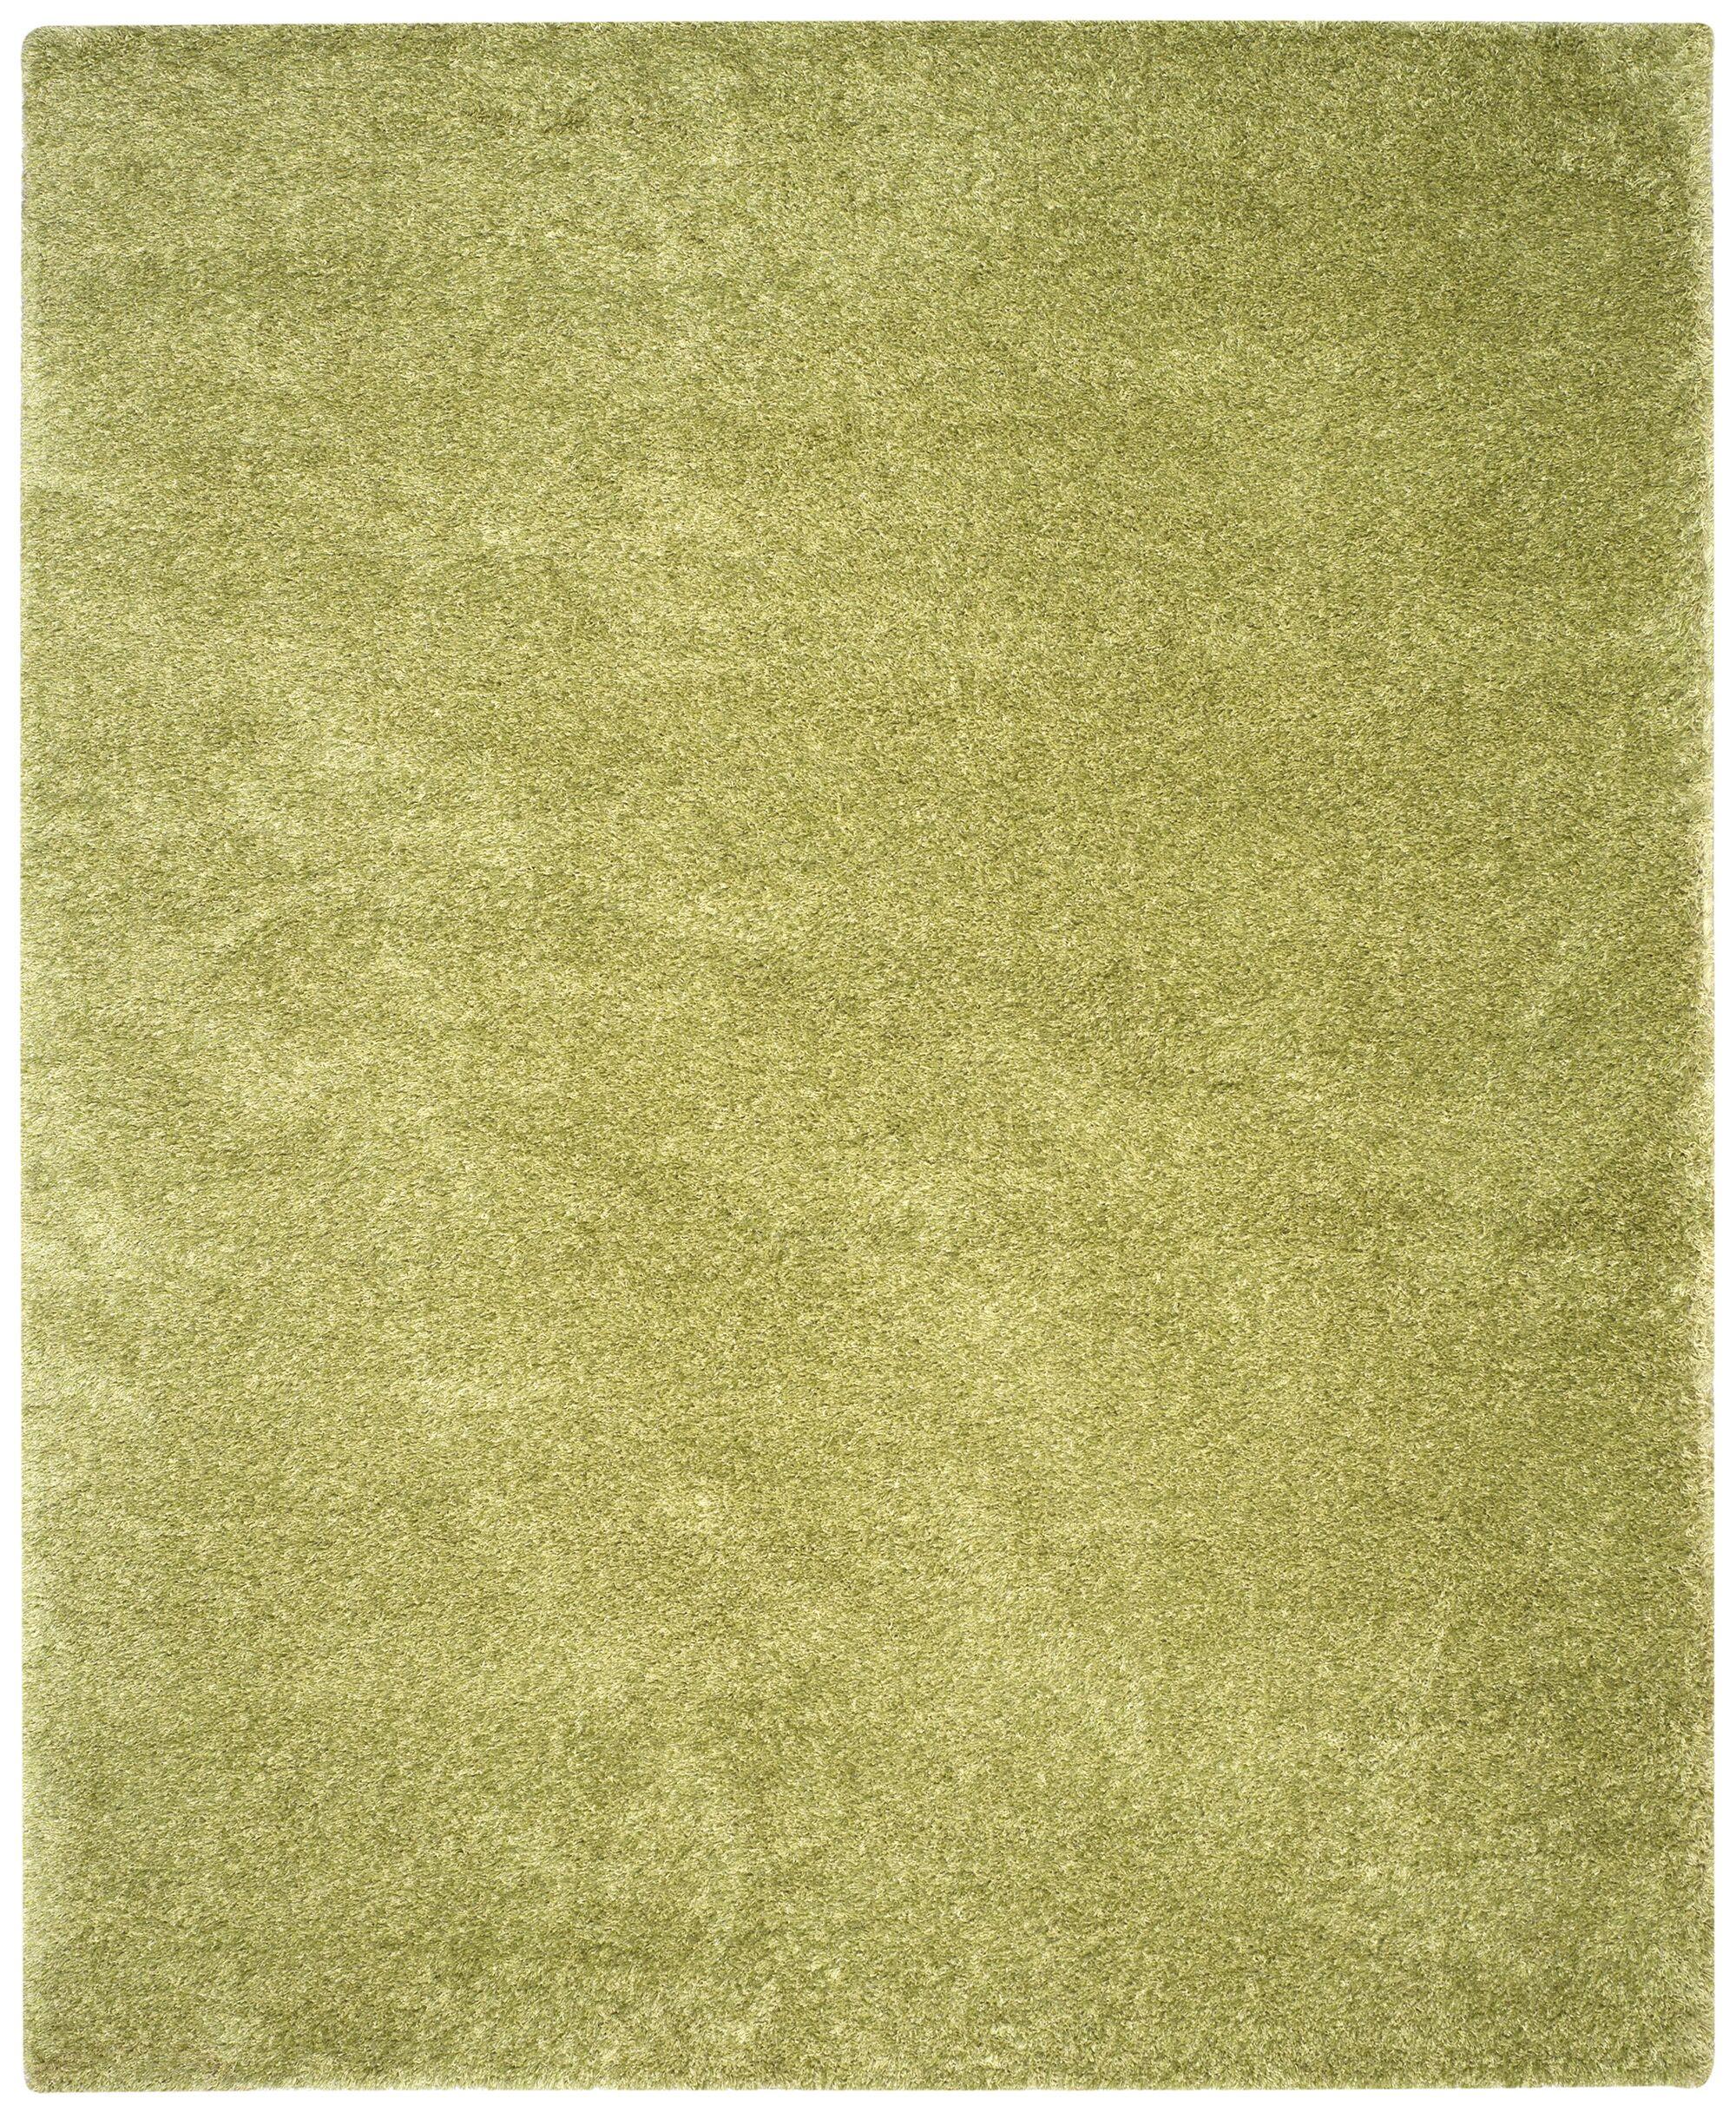 Davey Green Rug Rug Size: Rectangle 8' x 10'